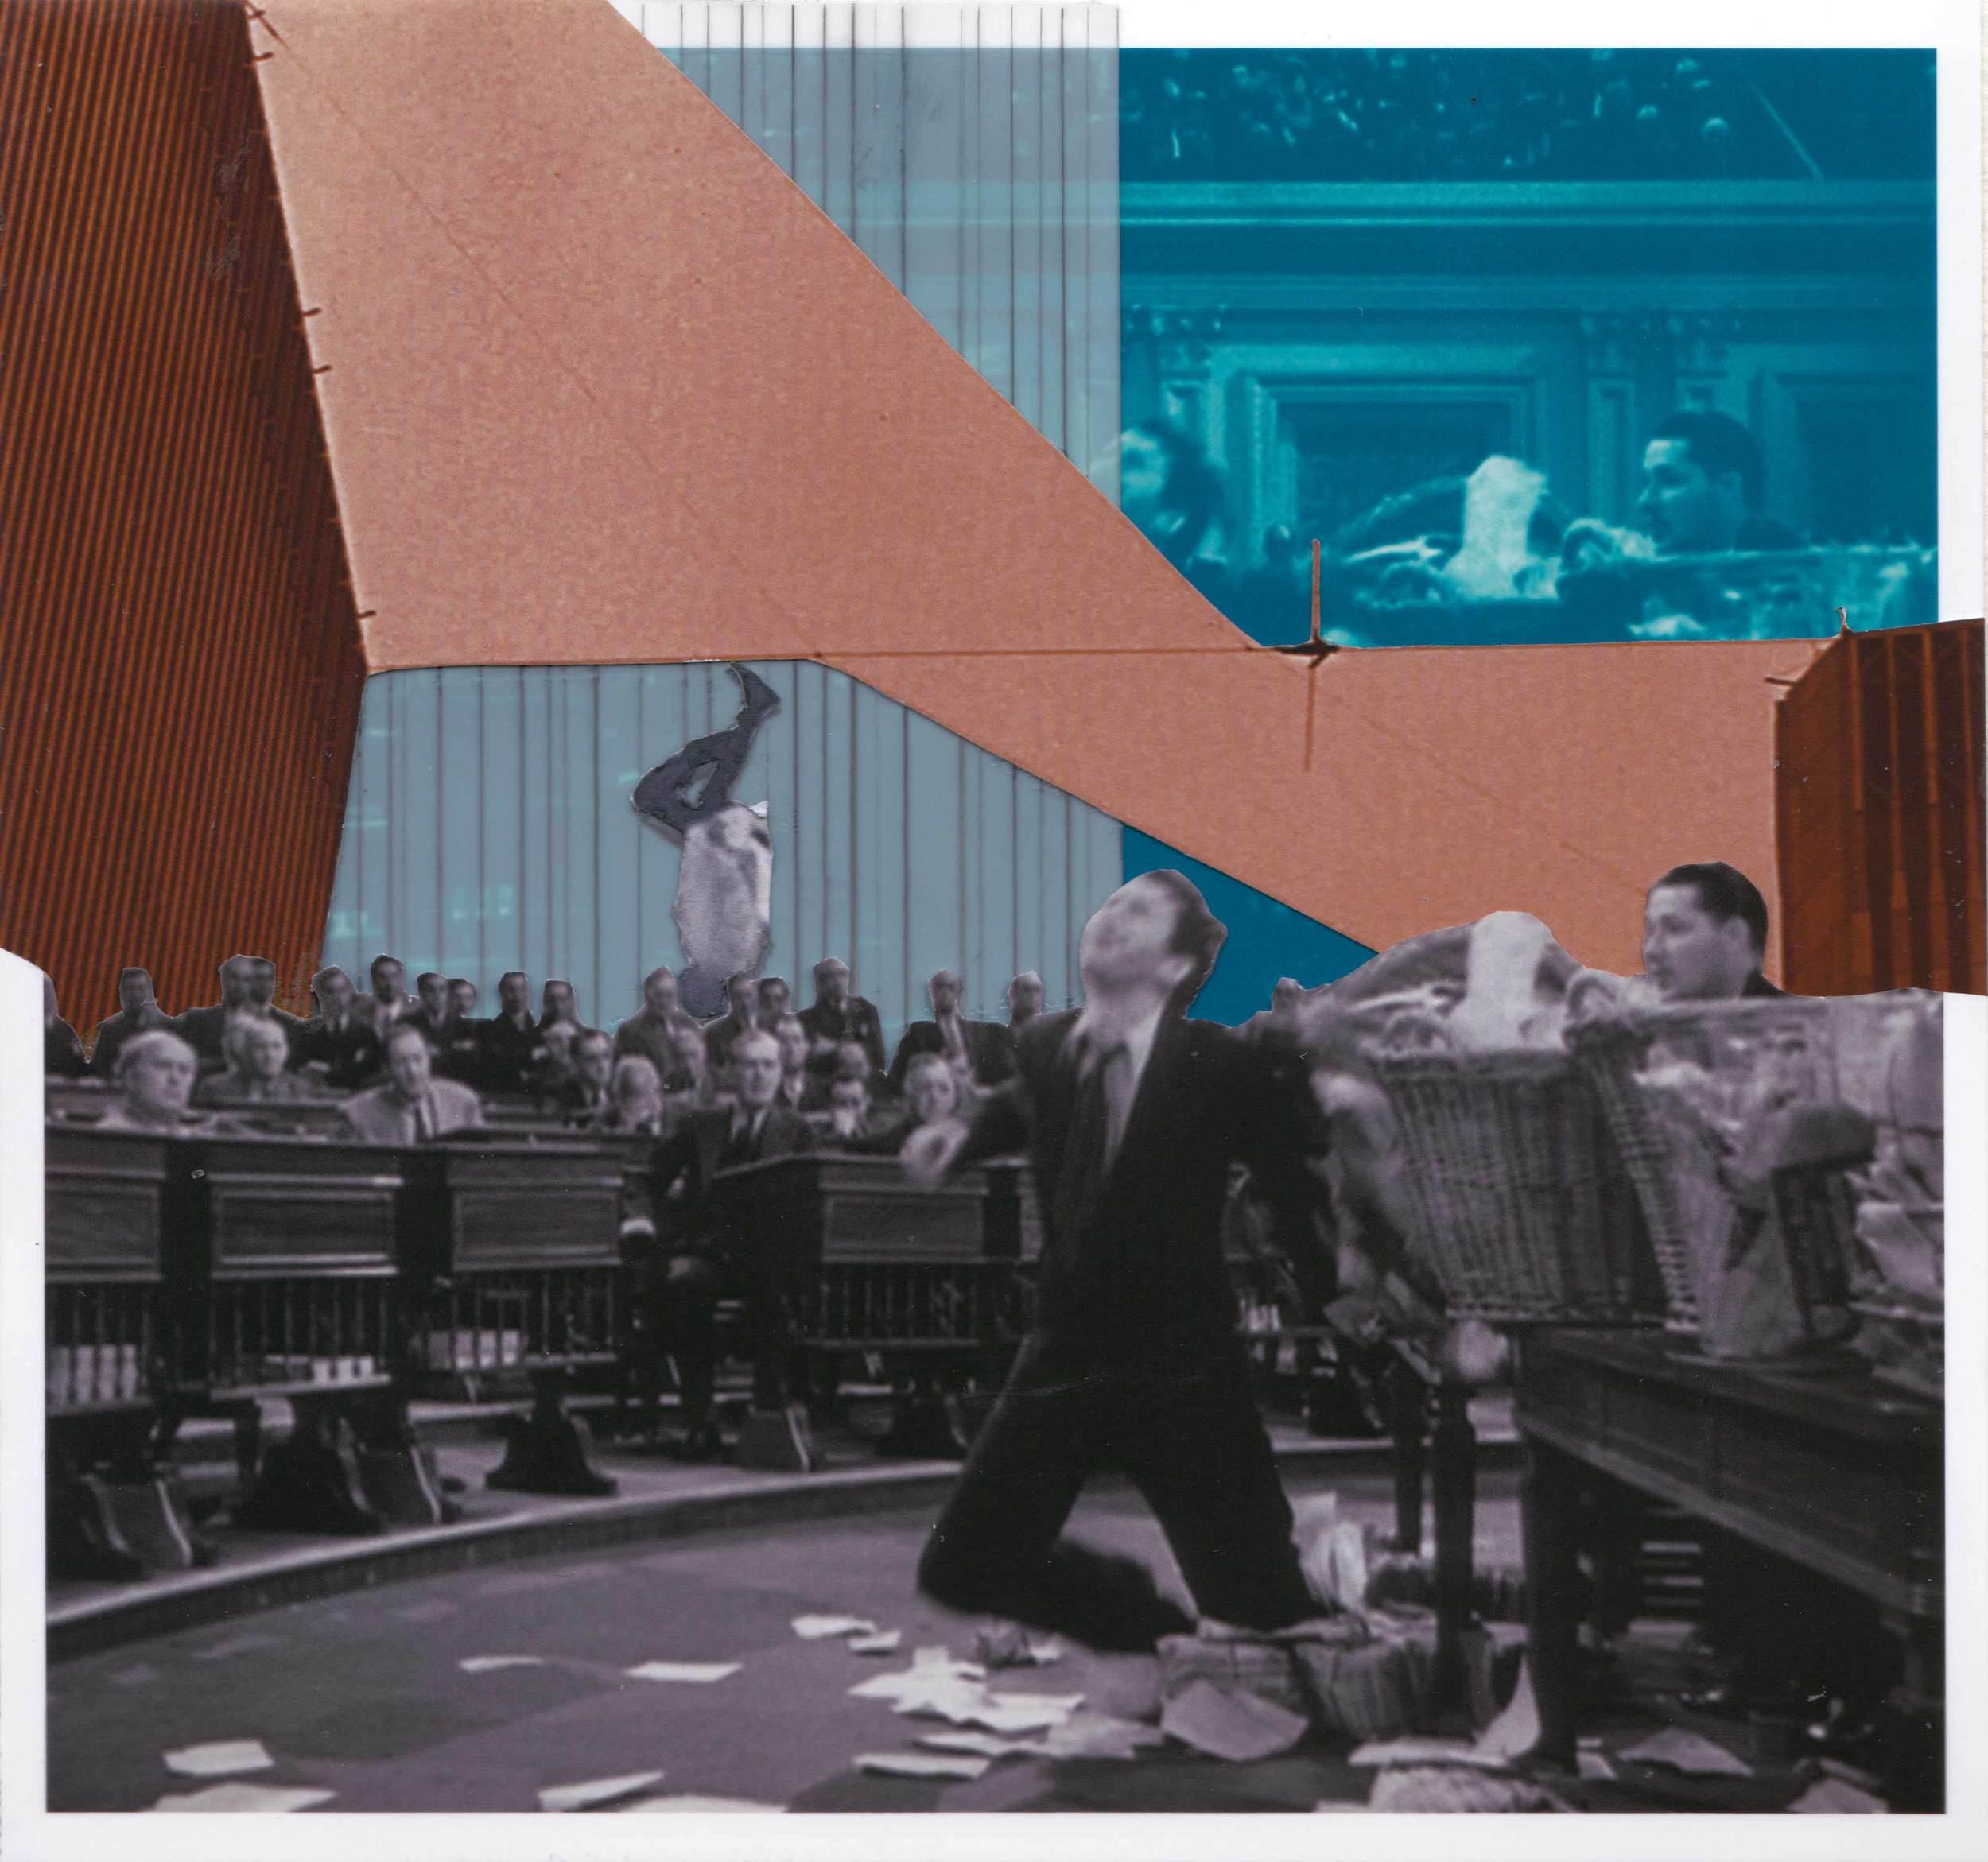 Collage_mrsmith&manonwire_small_copy.jpg